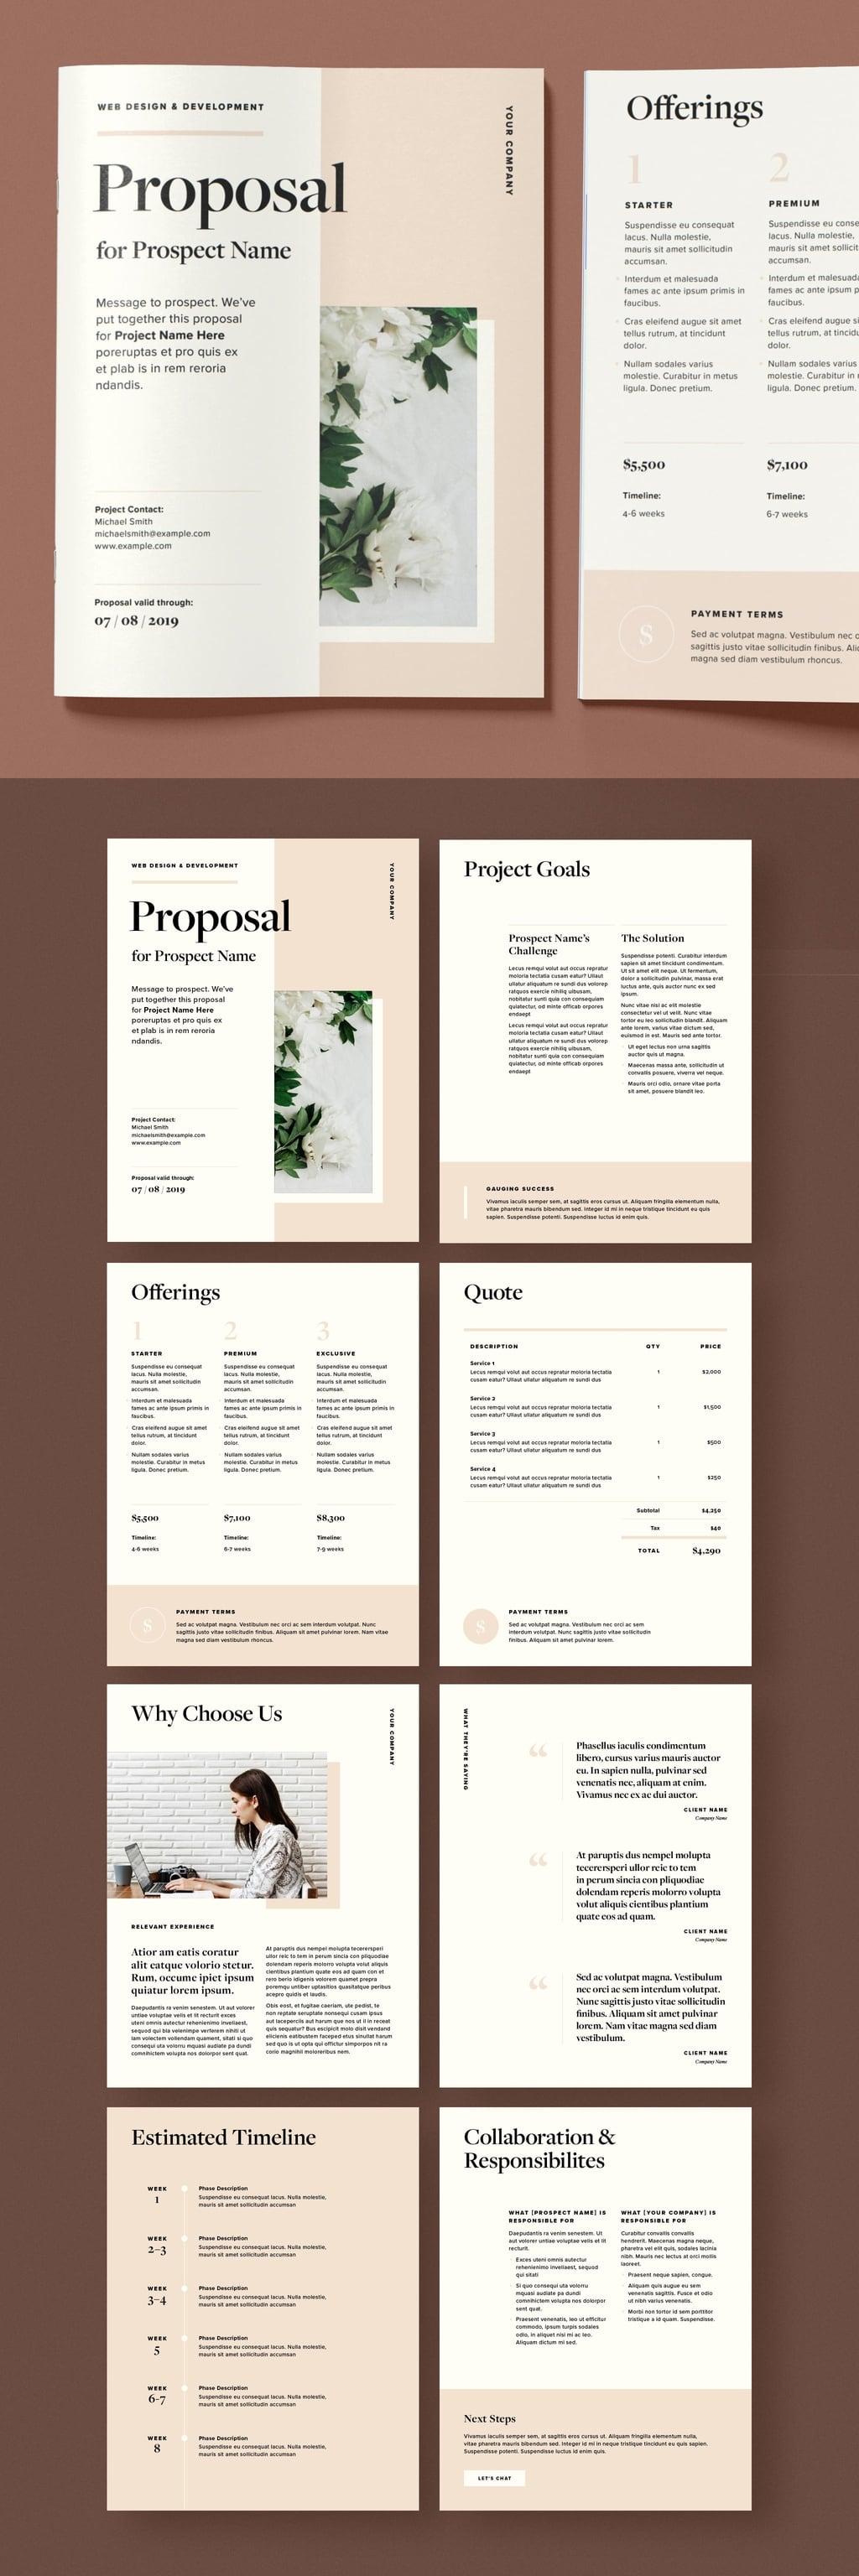 Minimalist yet imaginative brochure InDesign Template